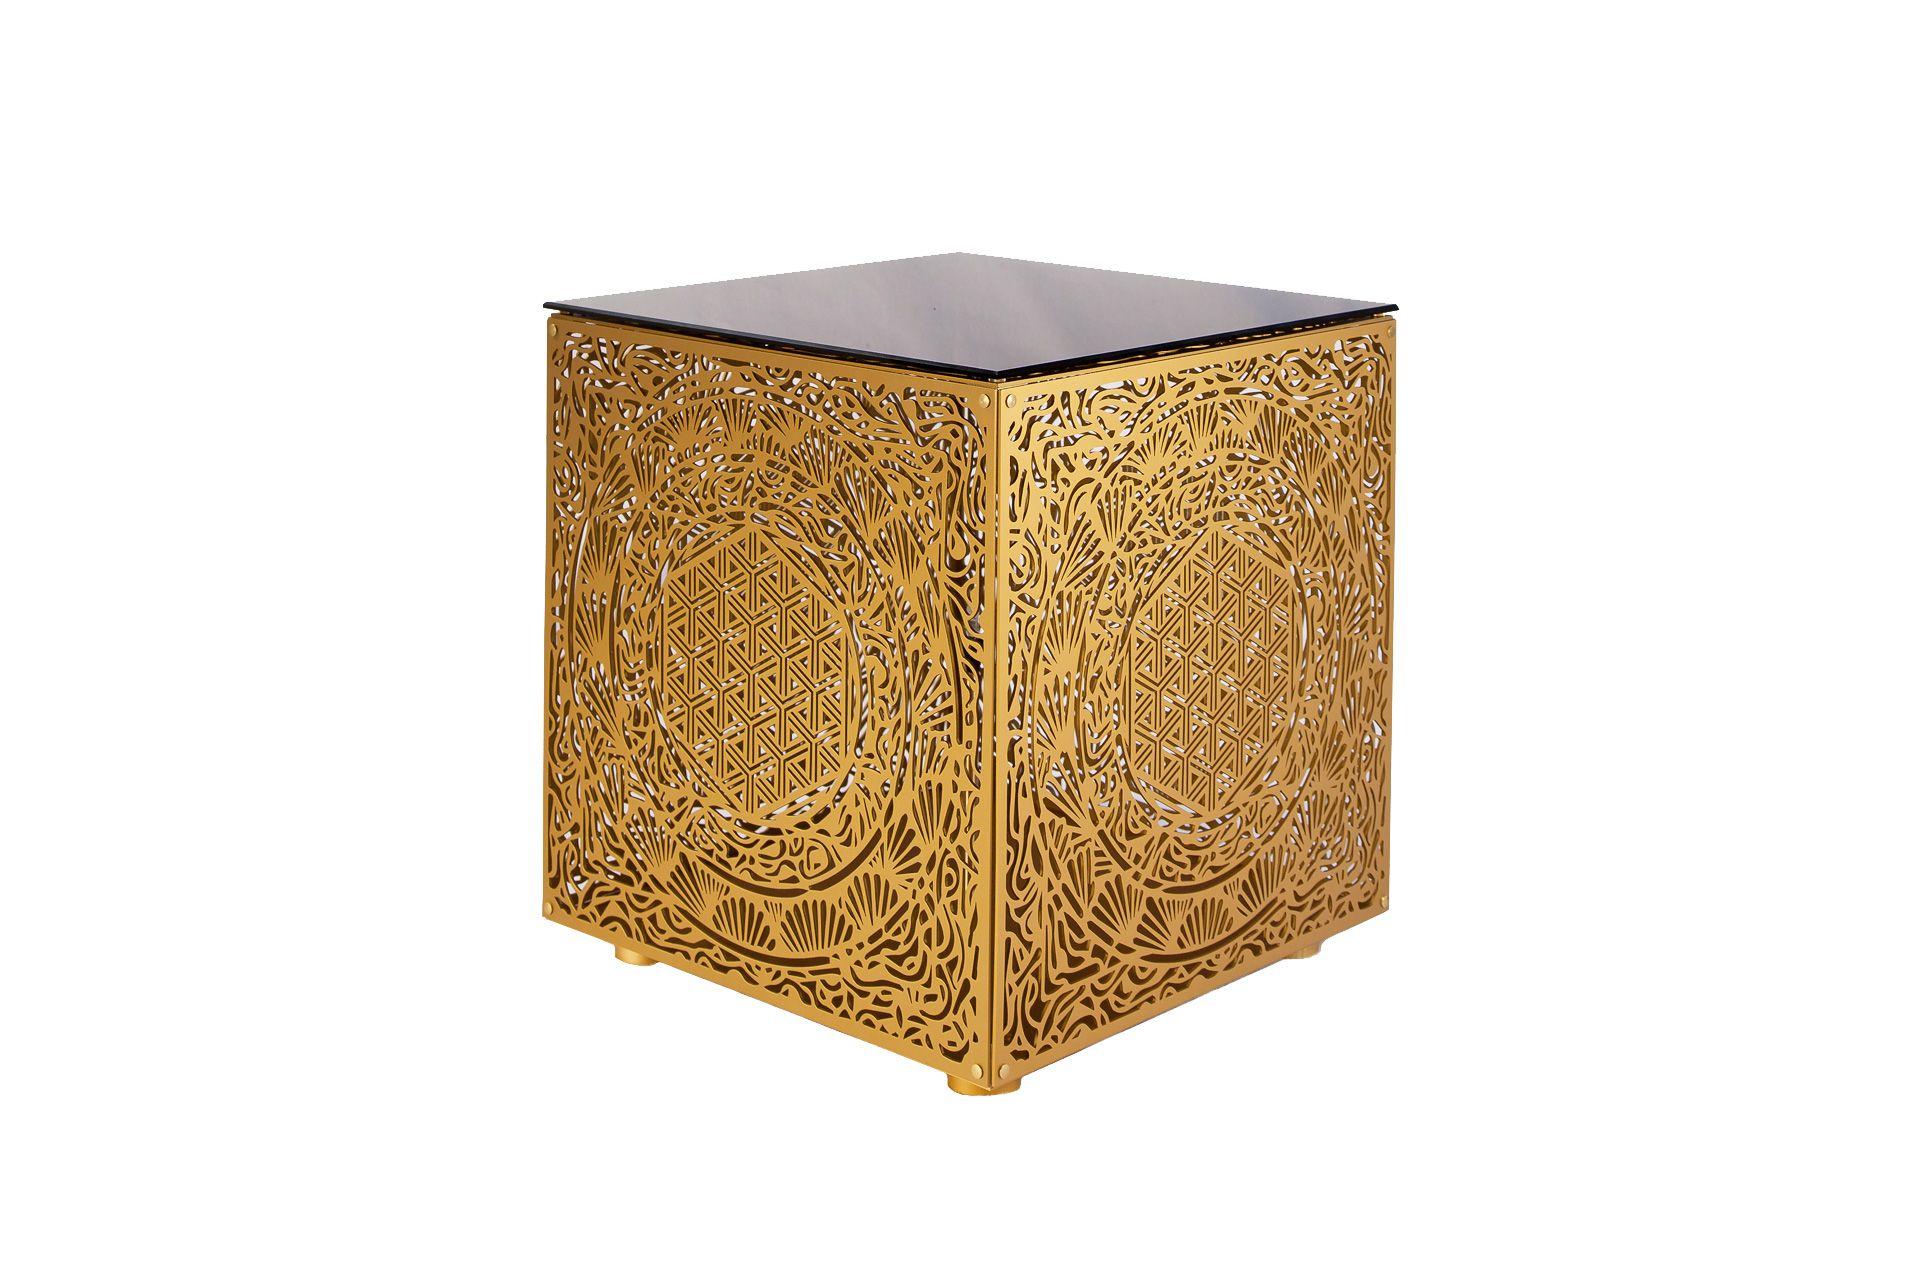 Sacrea Produkt-Bild: interieur-cube-500-1